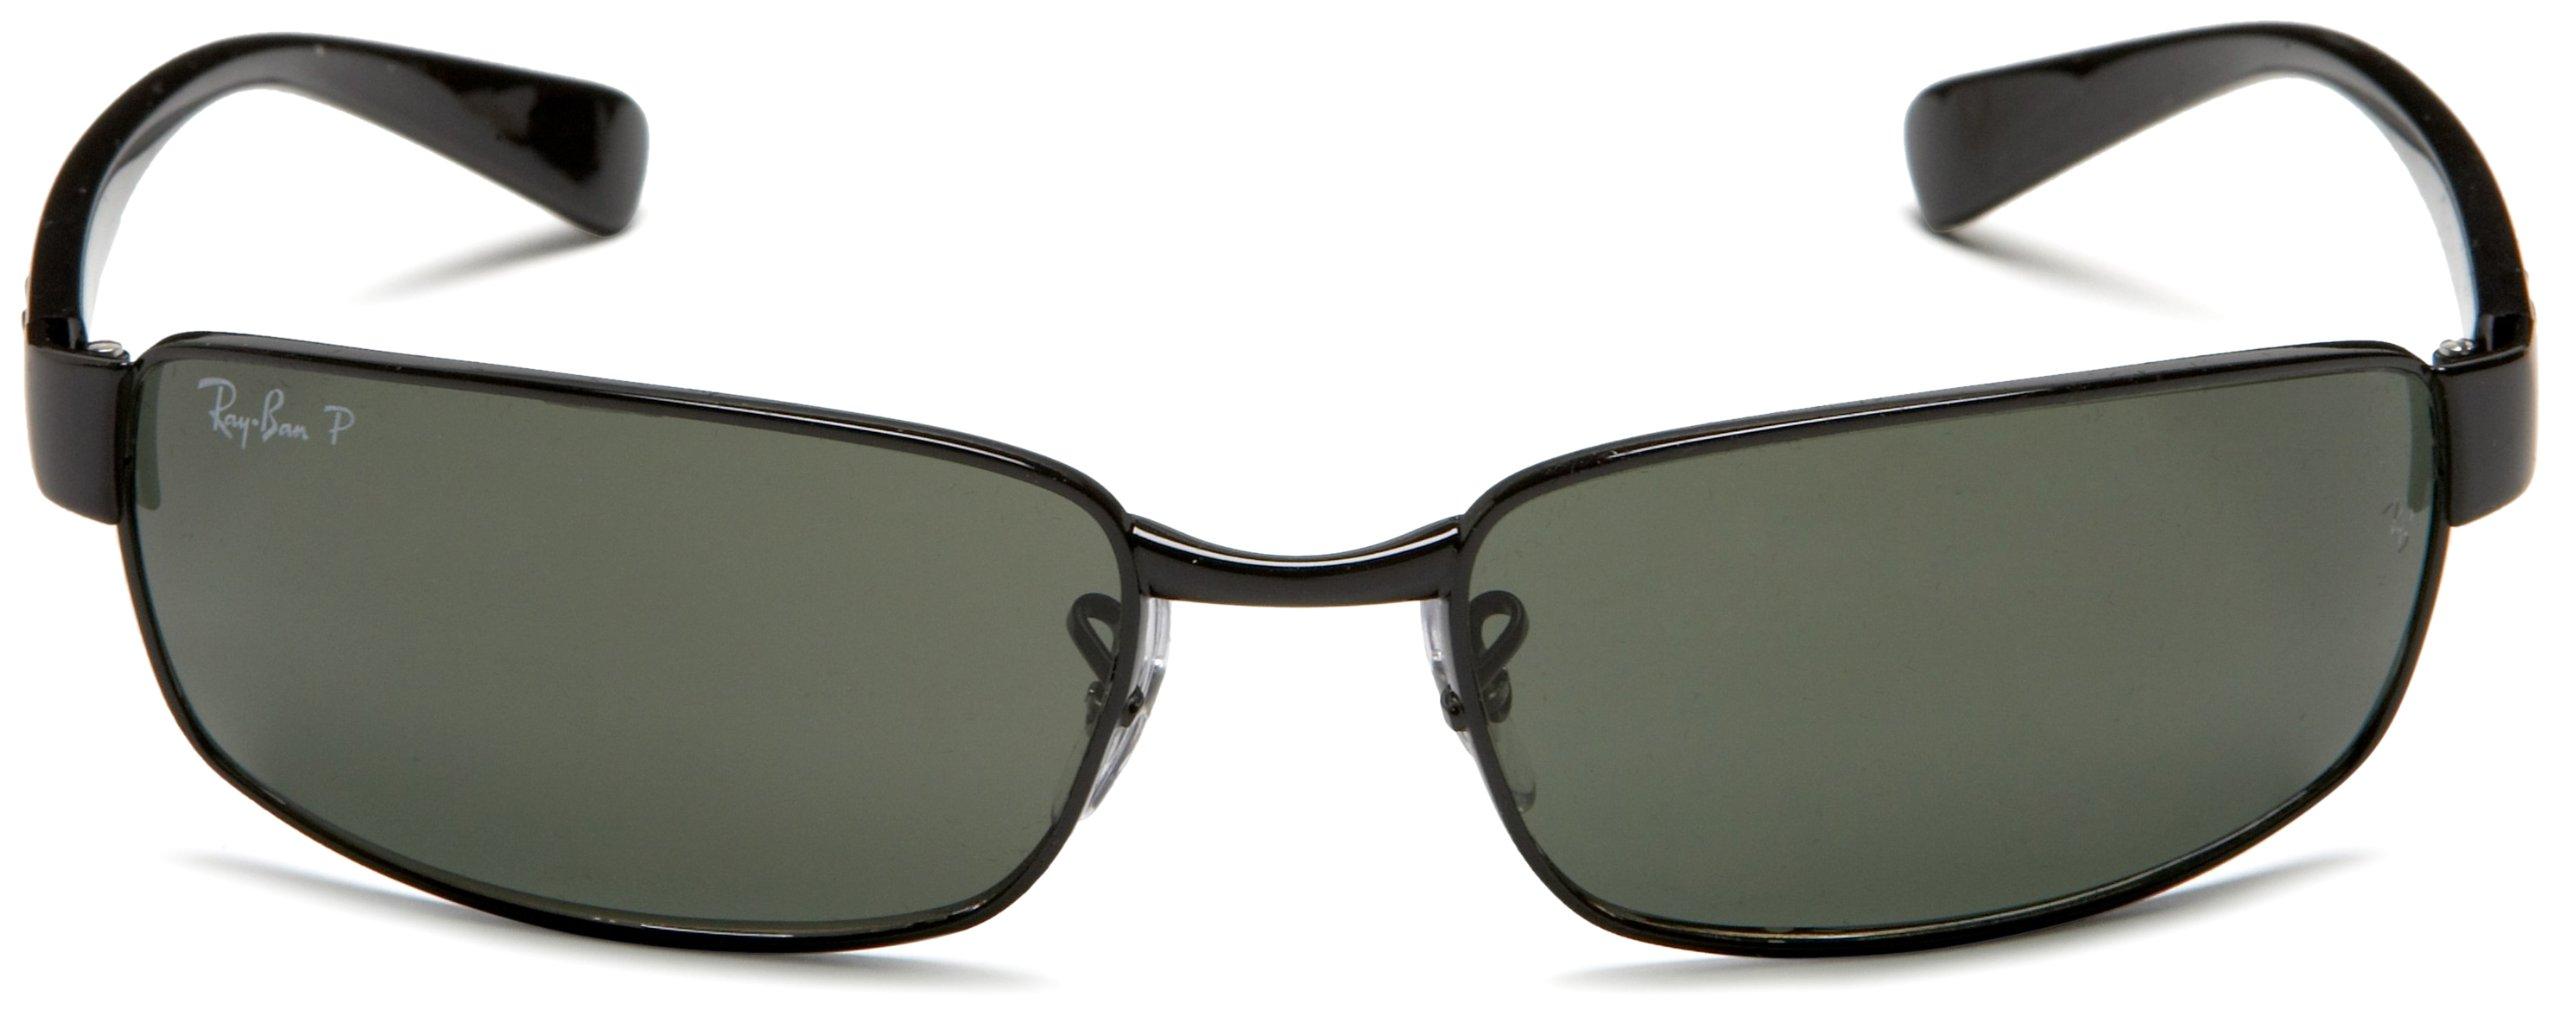 Ray-Ban RB3364 Rectangular Metal Sunglasses, Black/Polarized Green, 62 mm by Ray-Ban (Image #2)